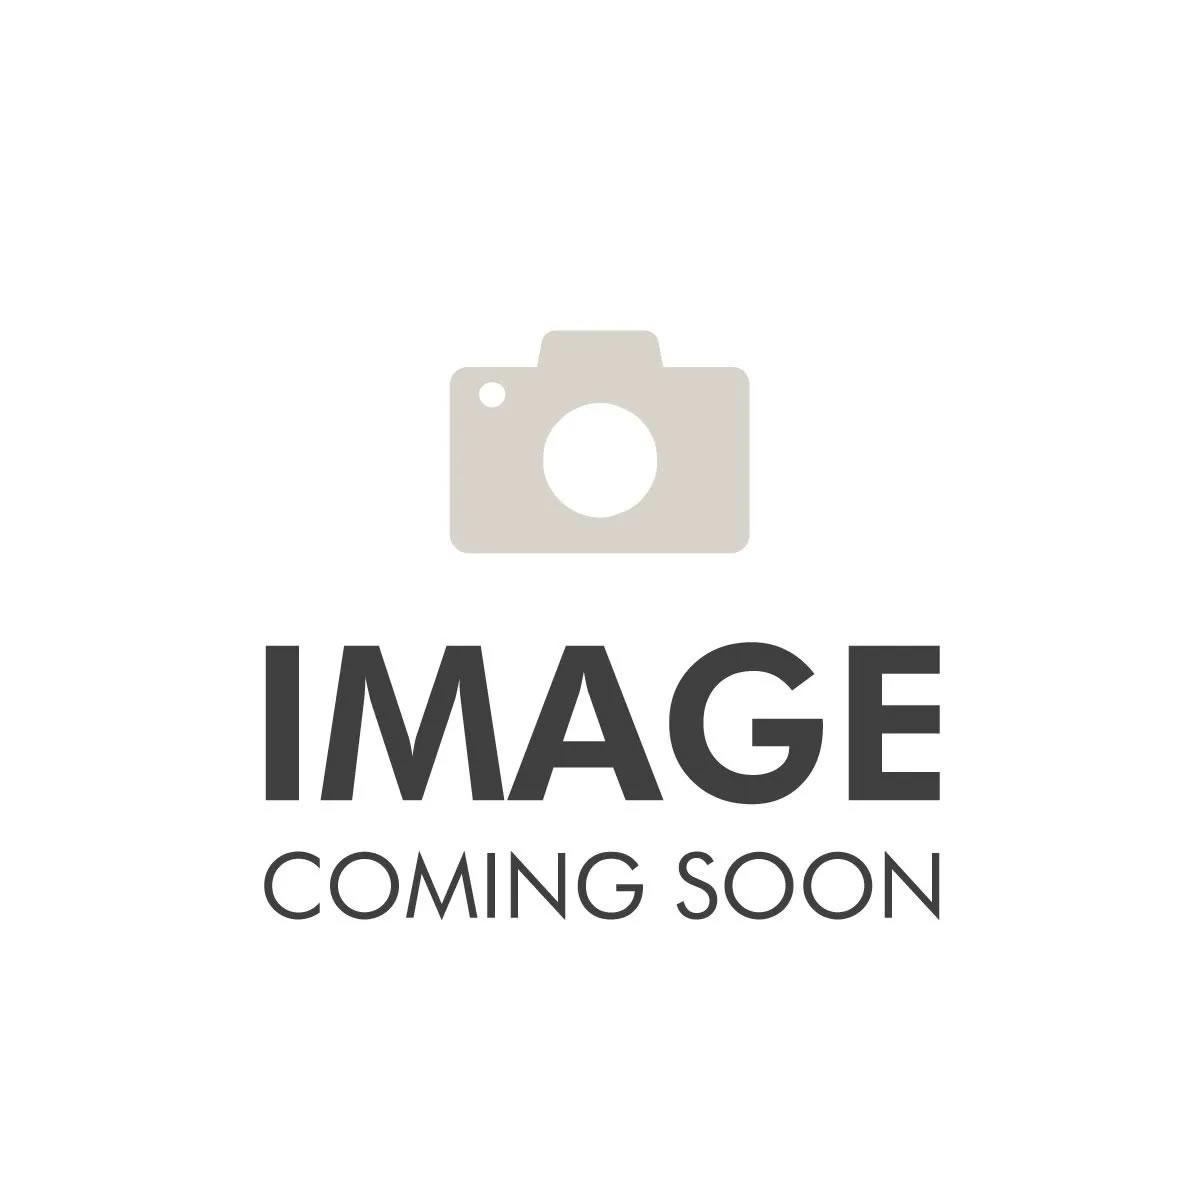 Soft Top, Khaki, Tinted Windows; 07-09 Jeep Wrangler JK